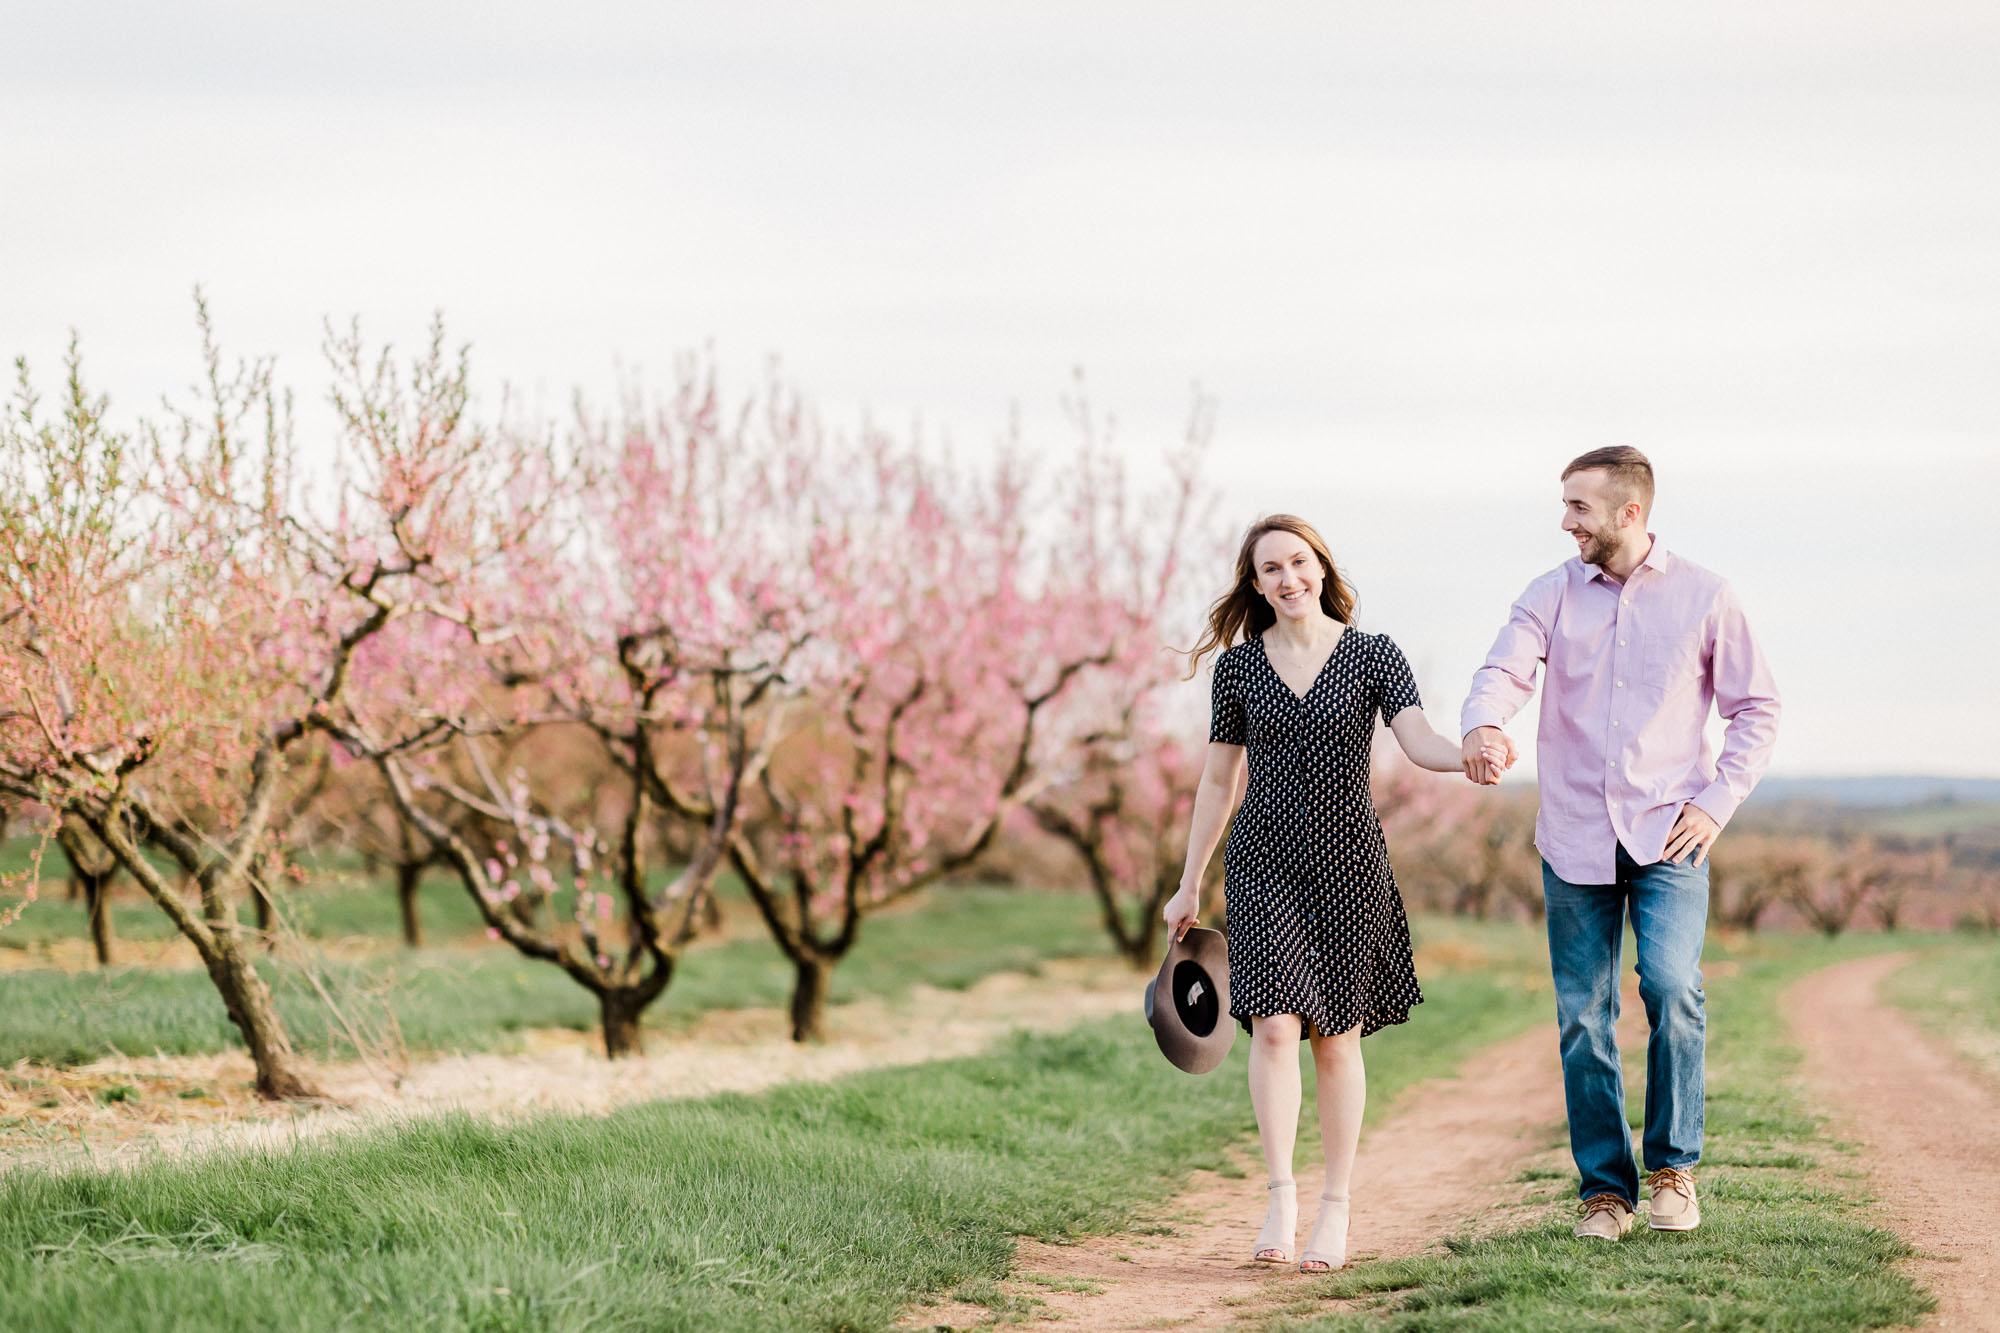 Rohrbachs-Spring-cherry-blossom-engagement-7456.jpg